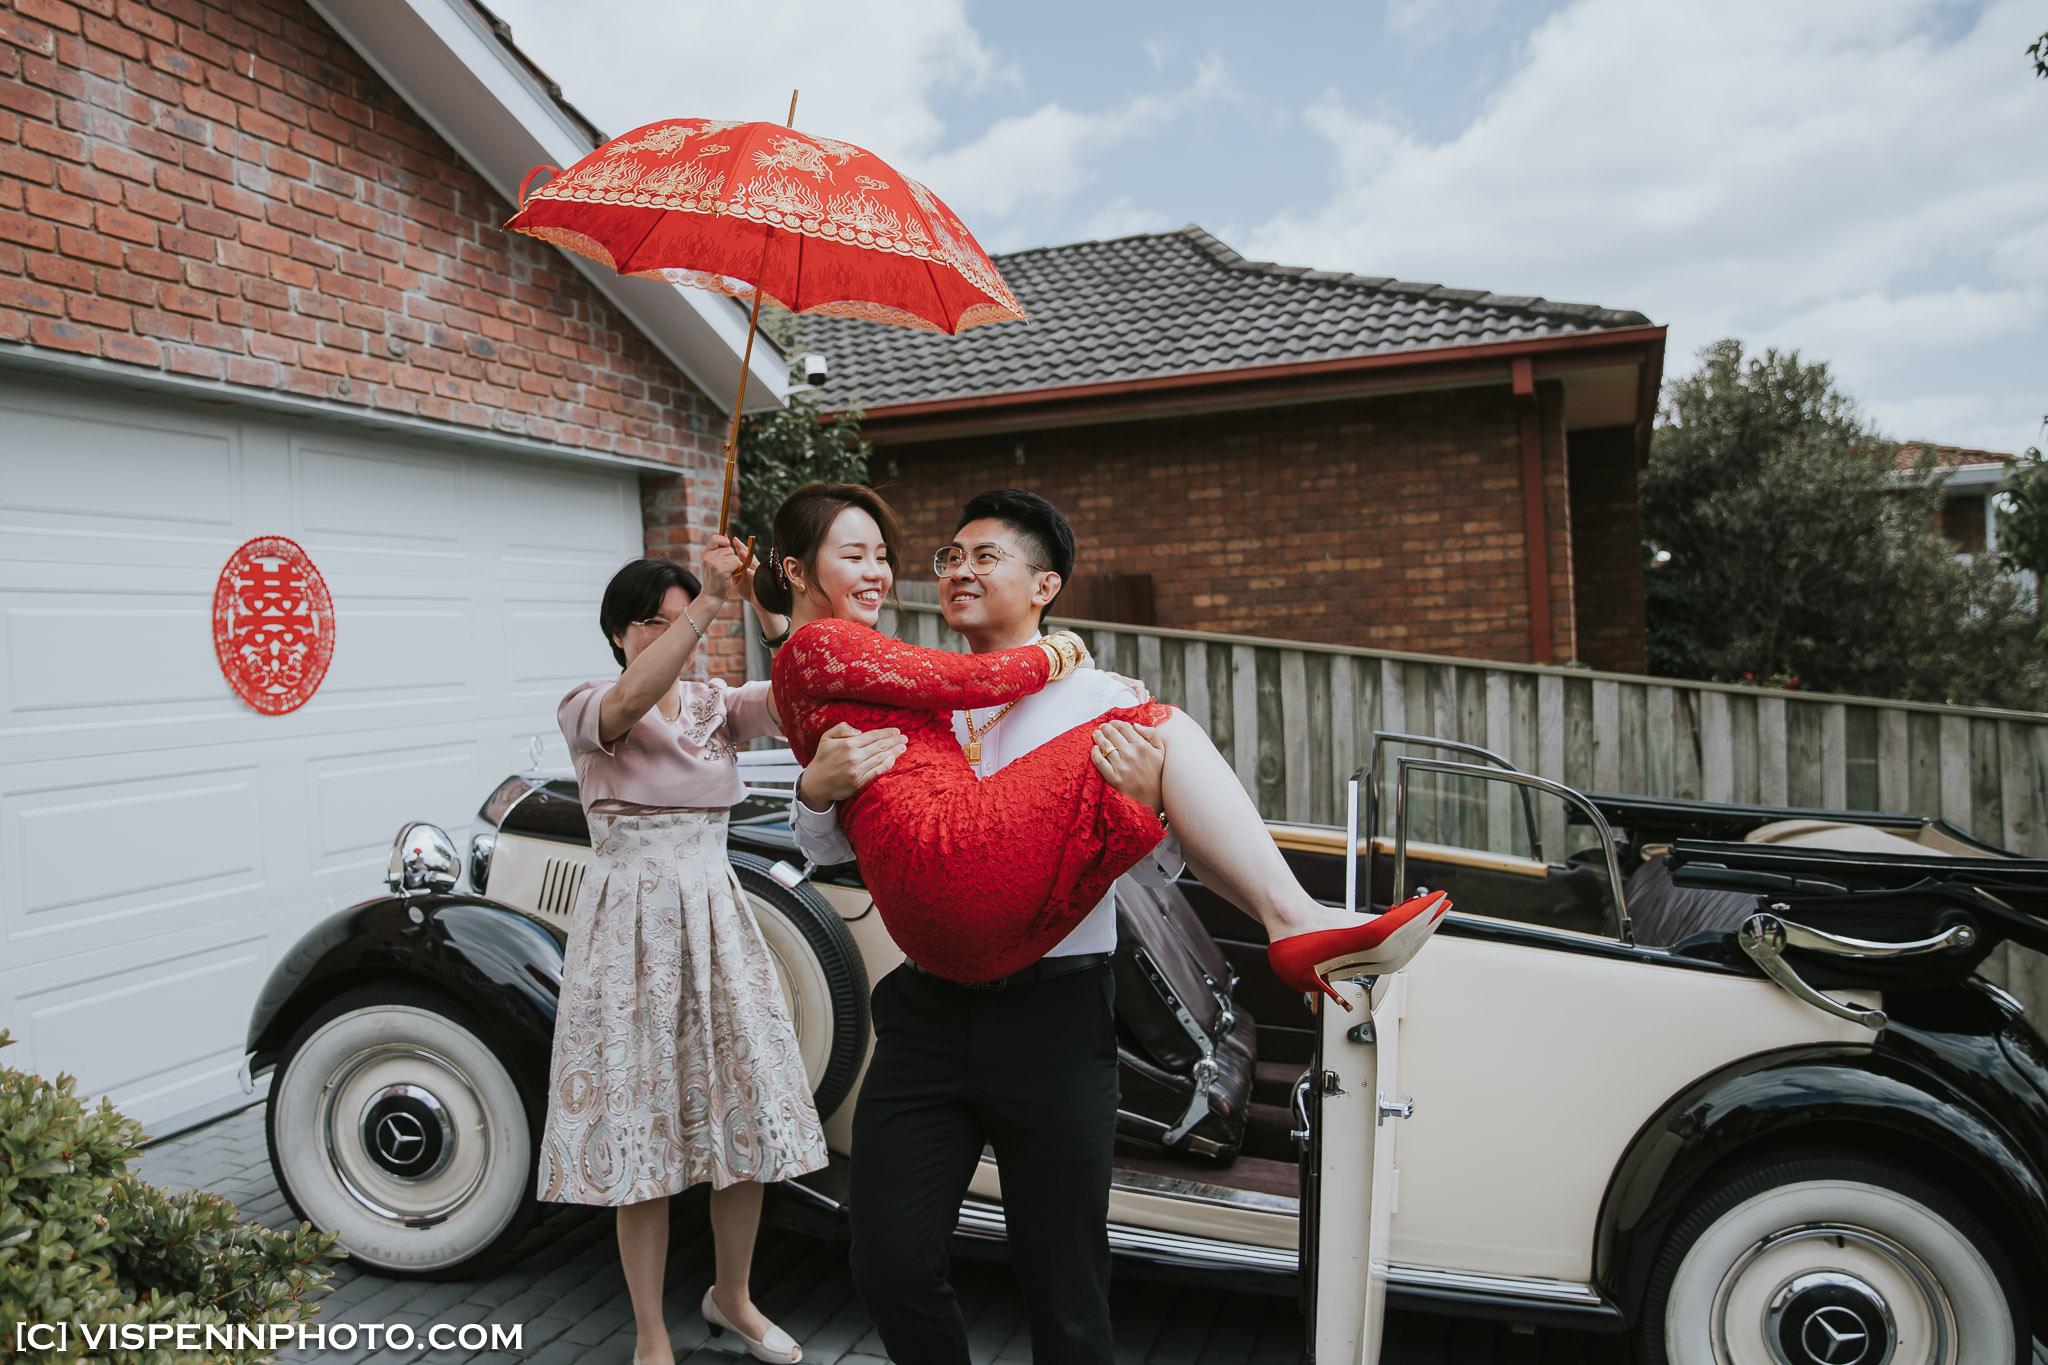 WEDDING DAY Photography Melbourne VISPENN 墨尔本 婚礼跟拍 婚礼摄像 婚礼摄影 结婚照 登记照 ElitaPB 02771 2P 1DX2 VISPENN